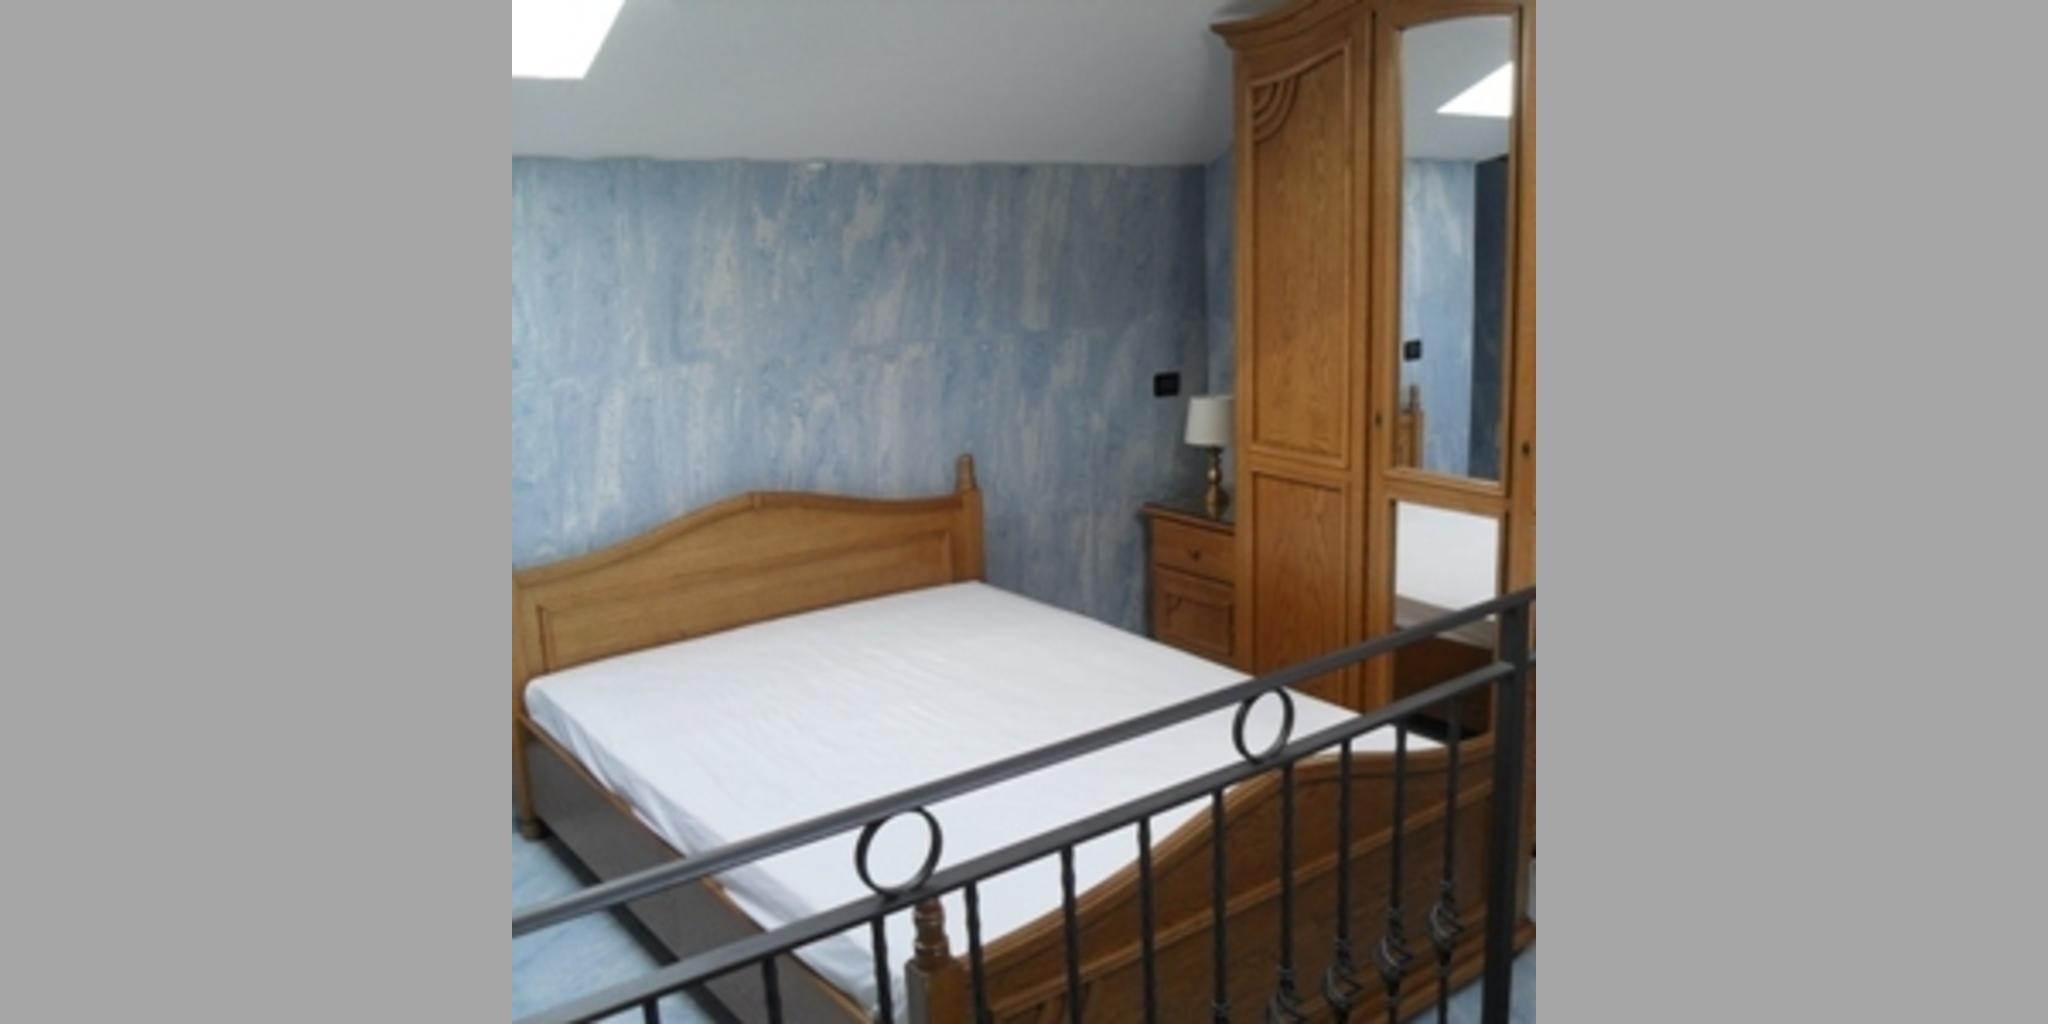 Bed & Breakfast Chiusdino - Montalcinello